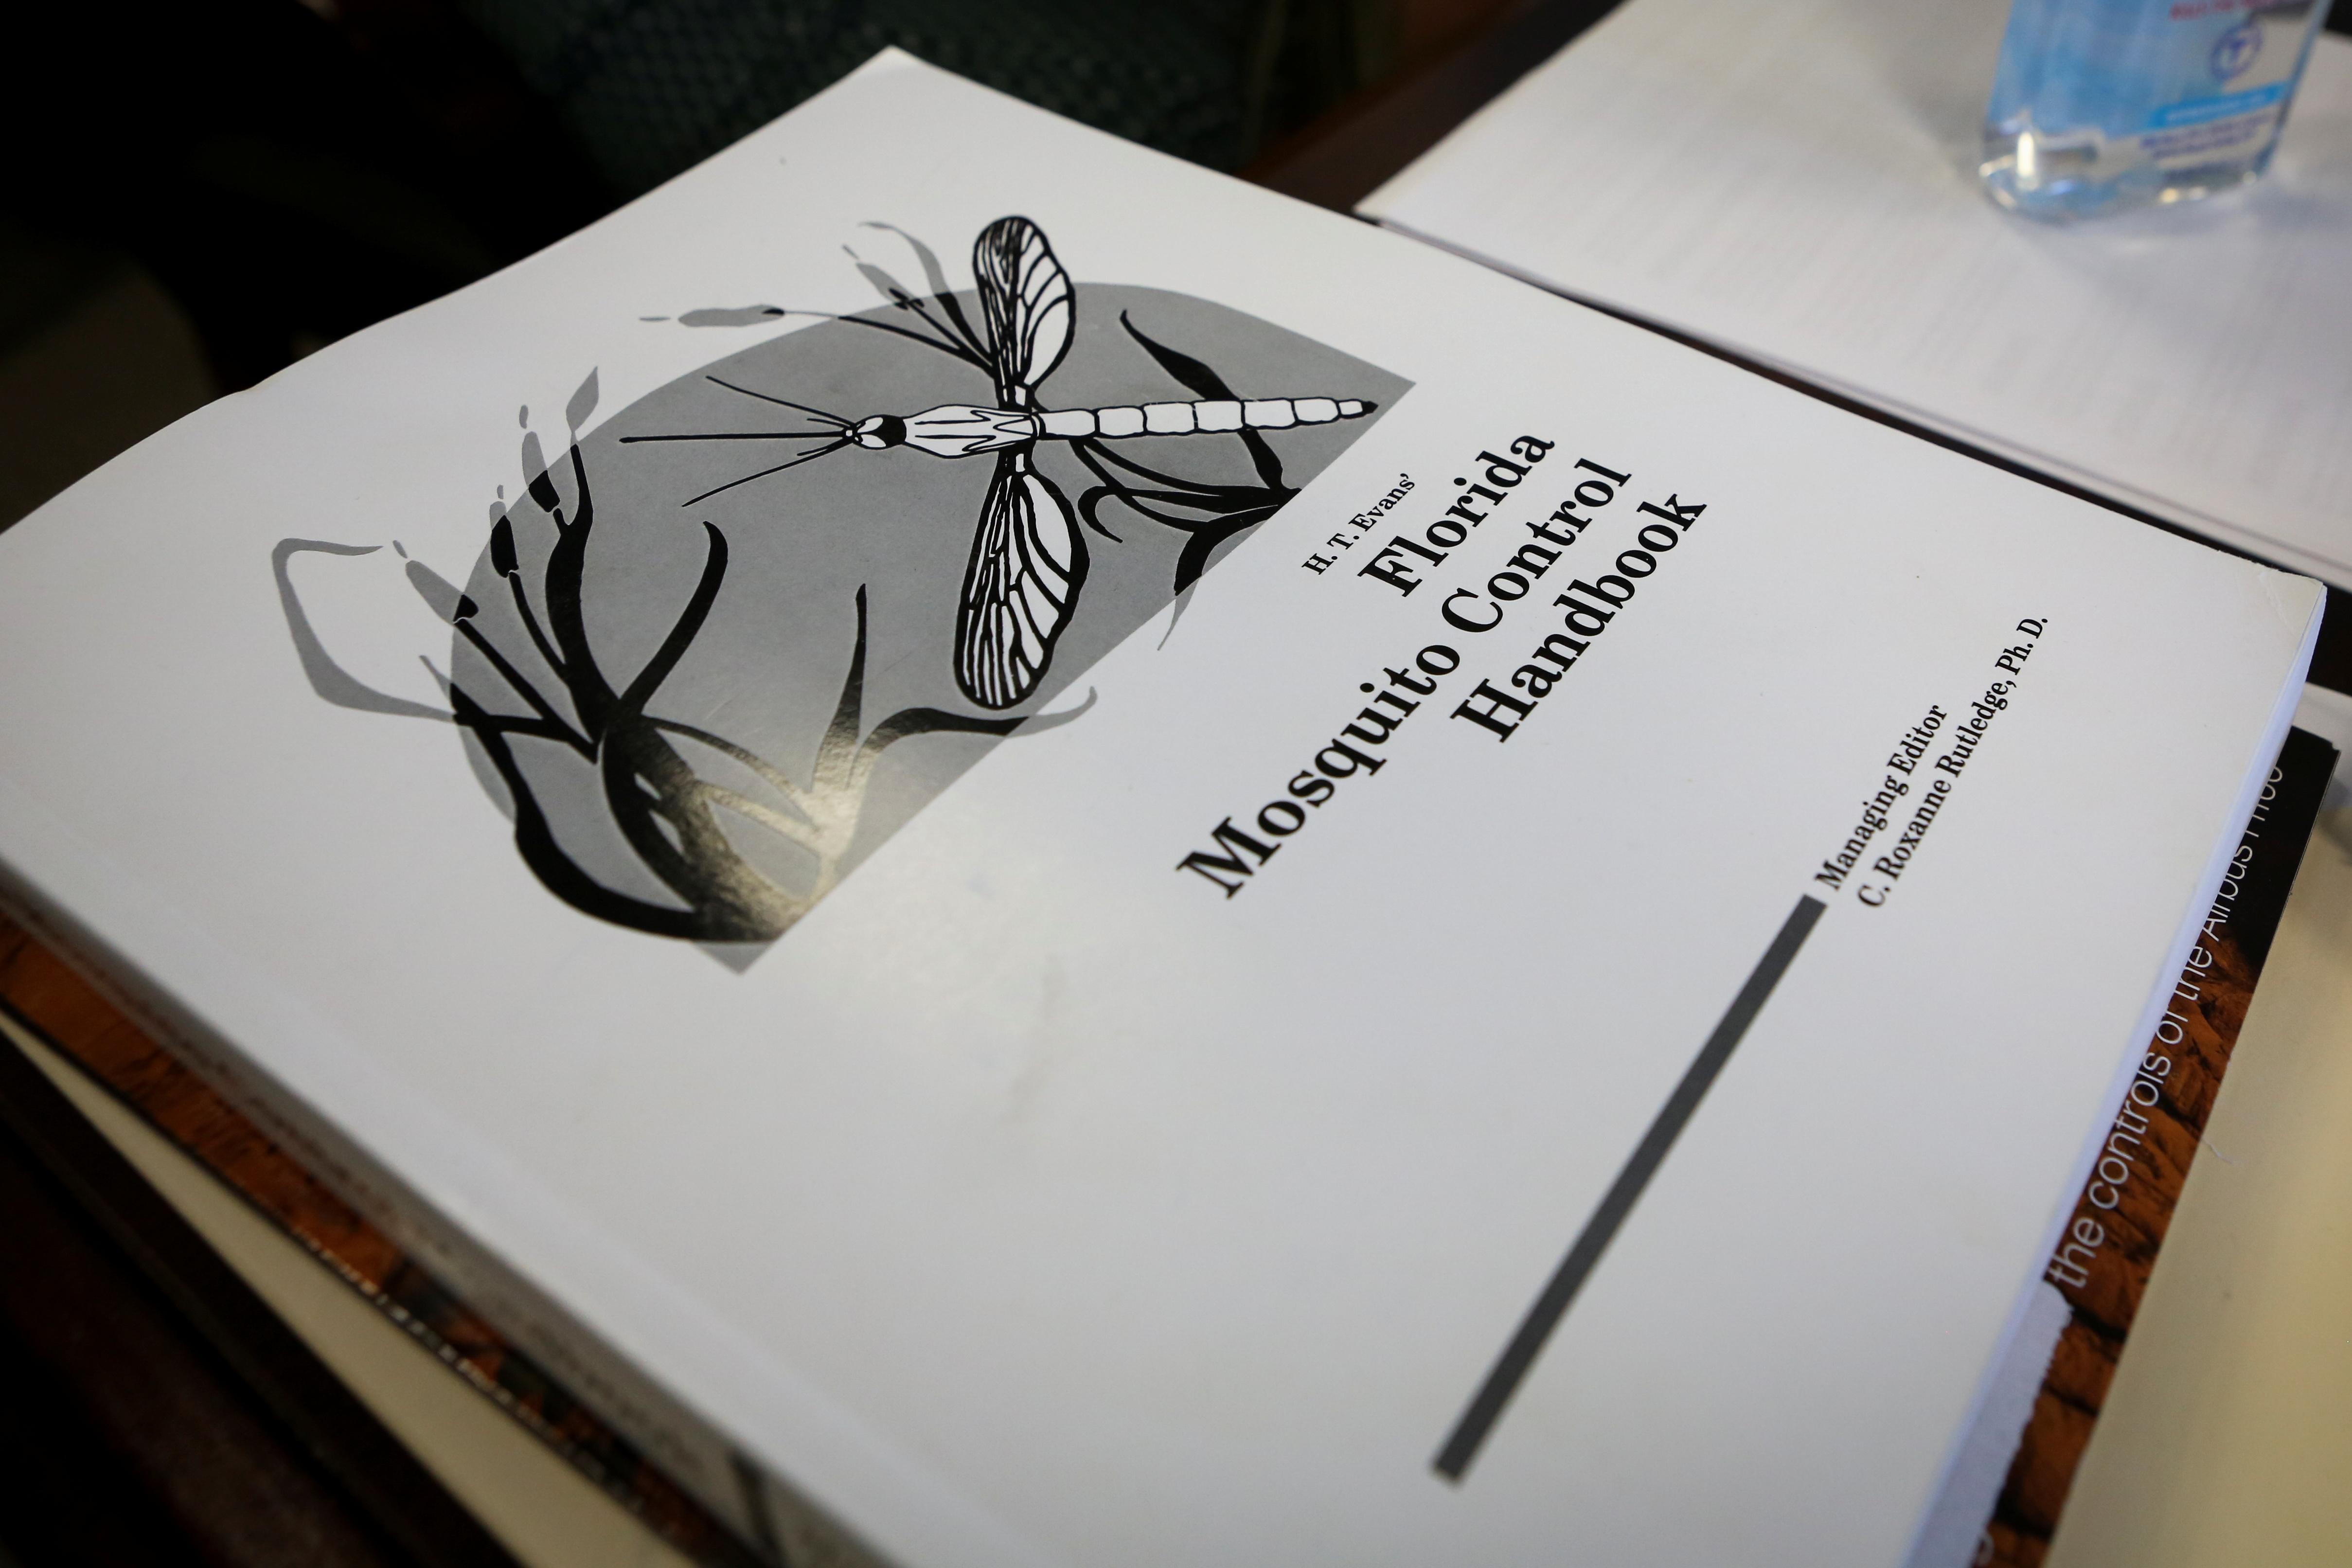 A handbook is seen at Florida Keys Mosquito Control District headquarters, in Marathon, Florida, U.S. May 4, 2021. REUTERS/Marco Bello